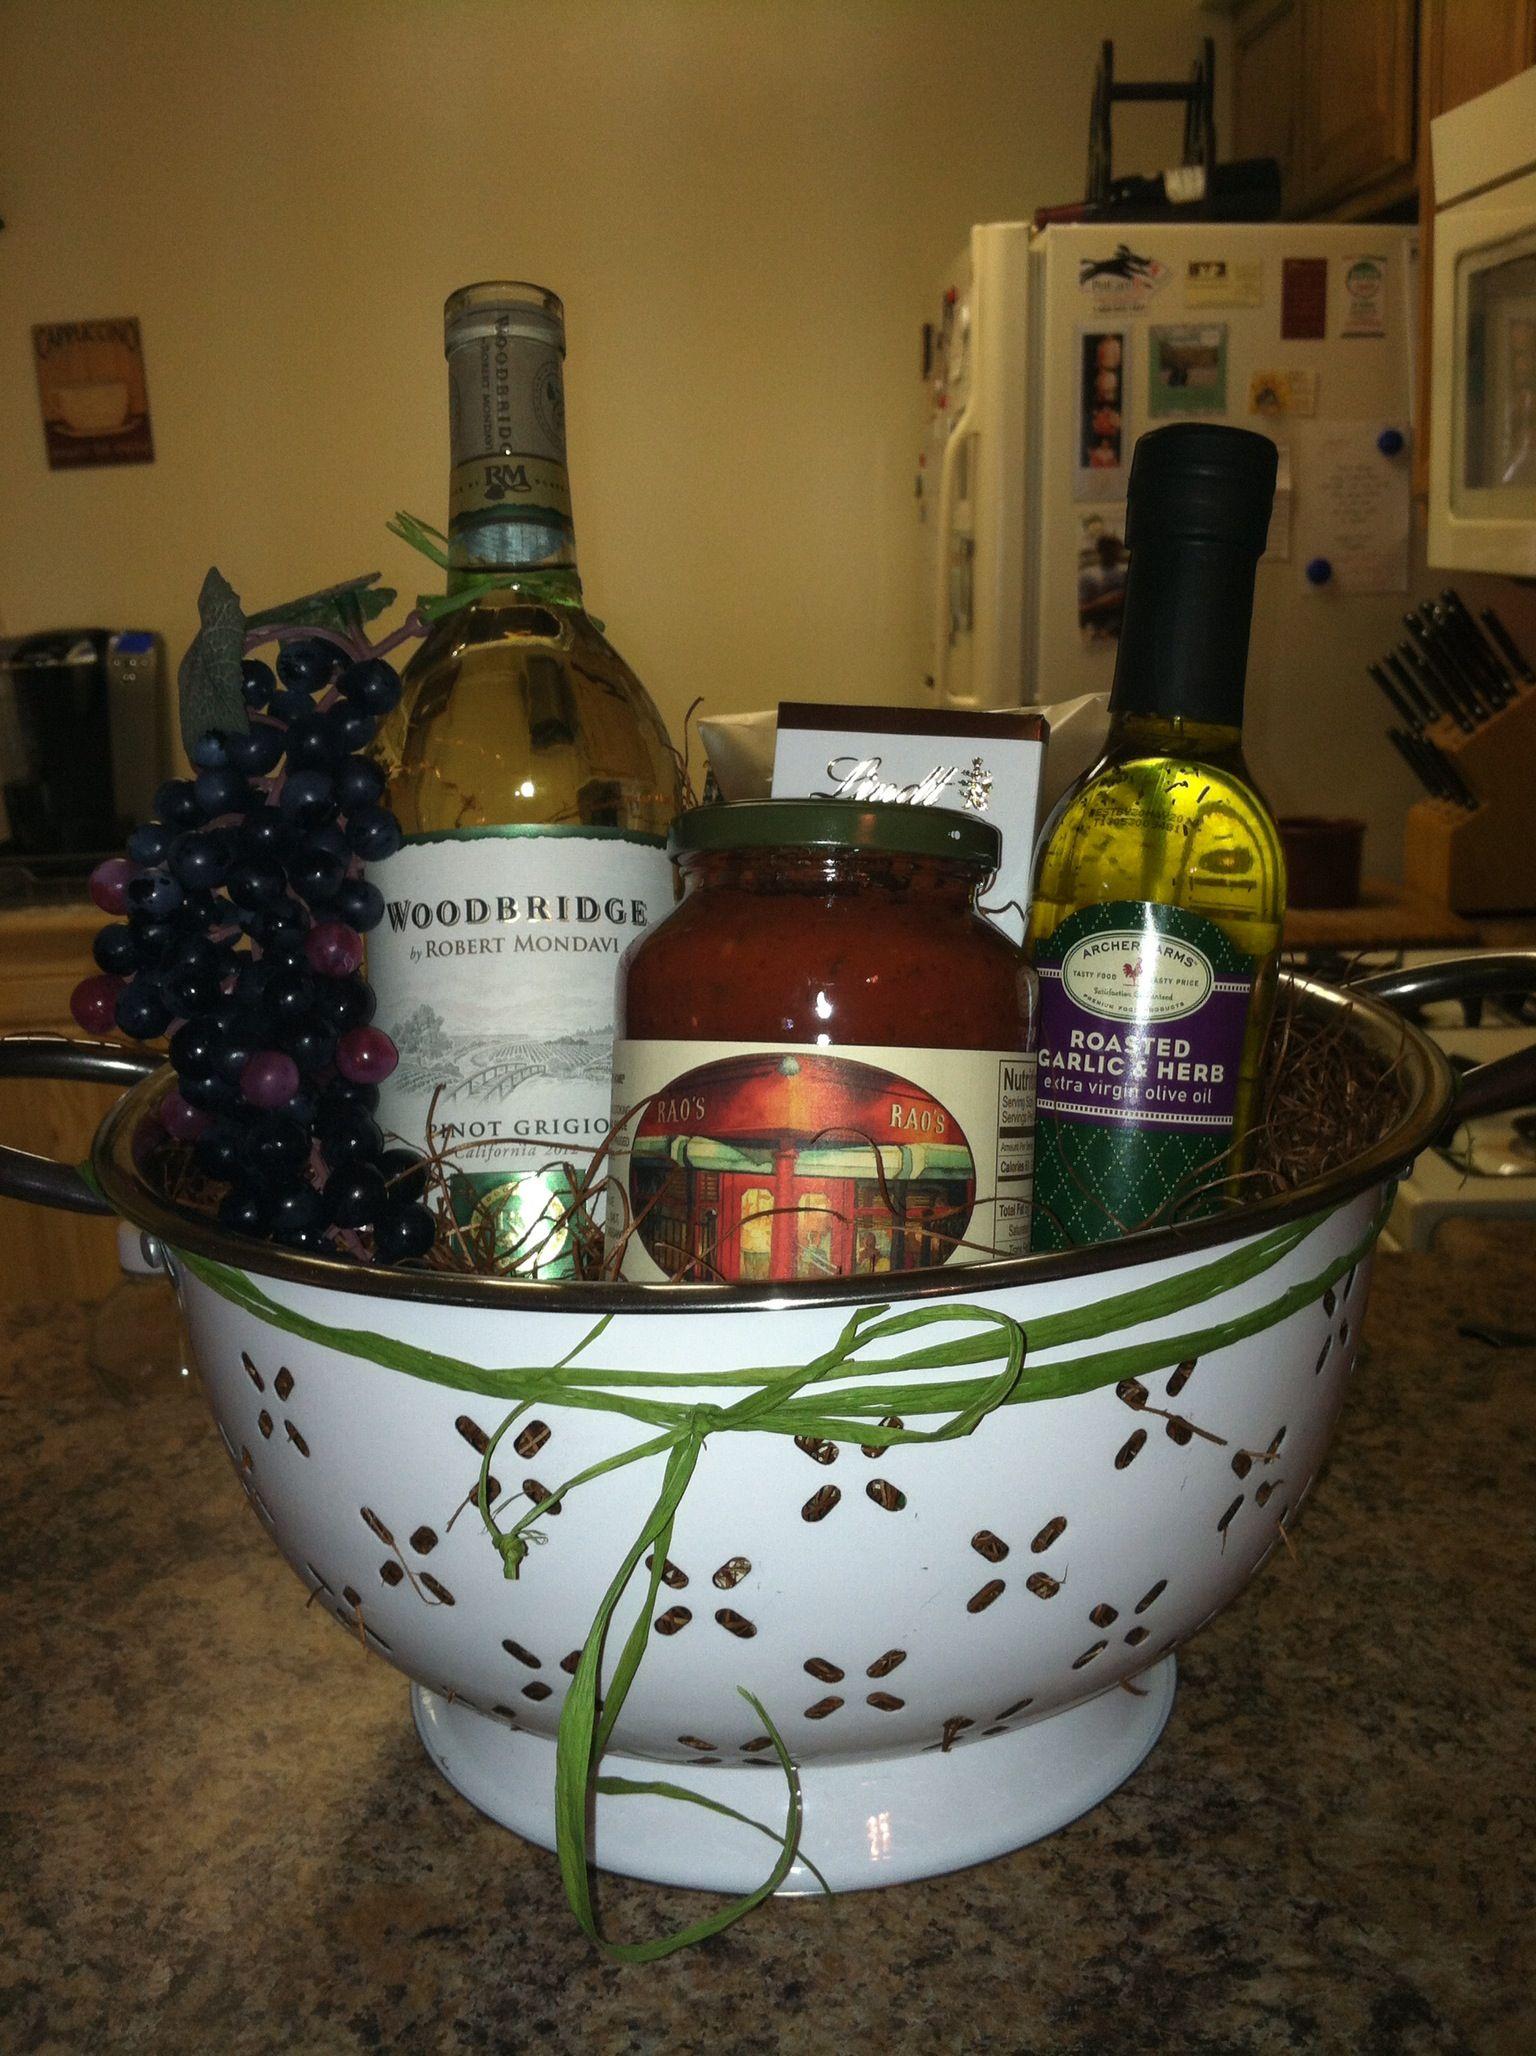 My housewarming basket gift ideas pinterest